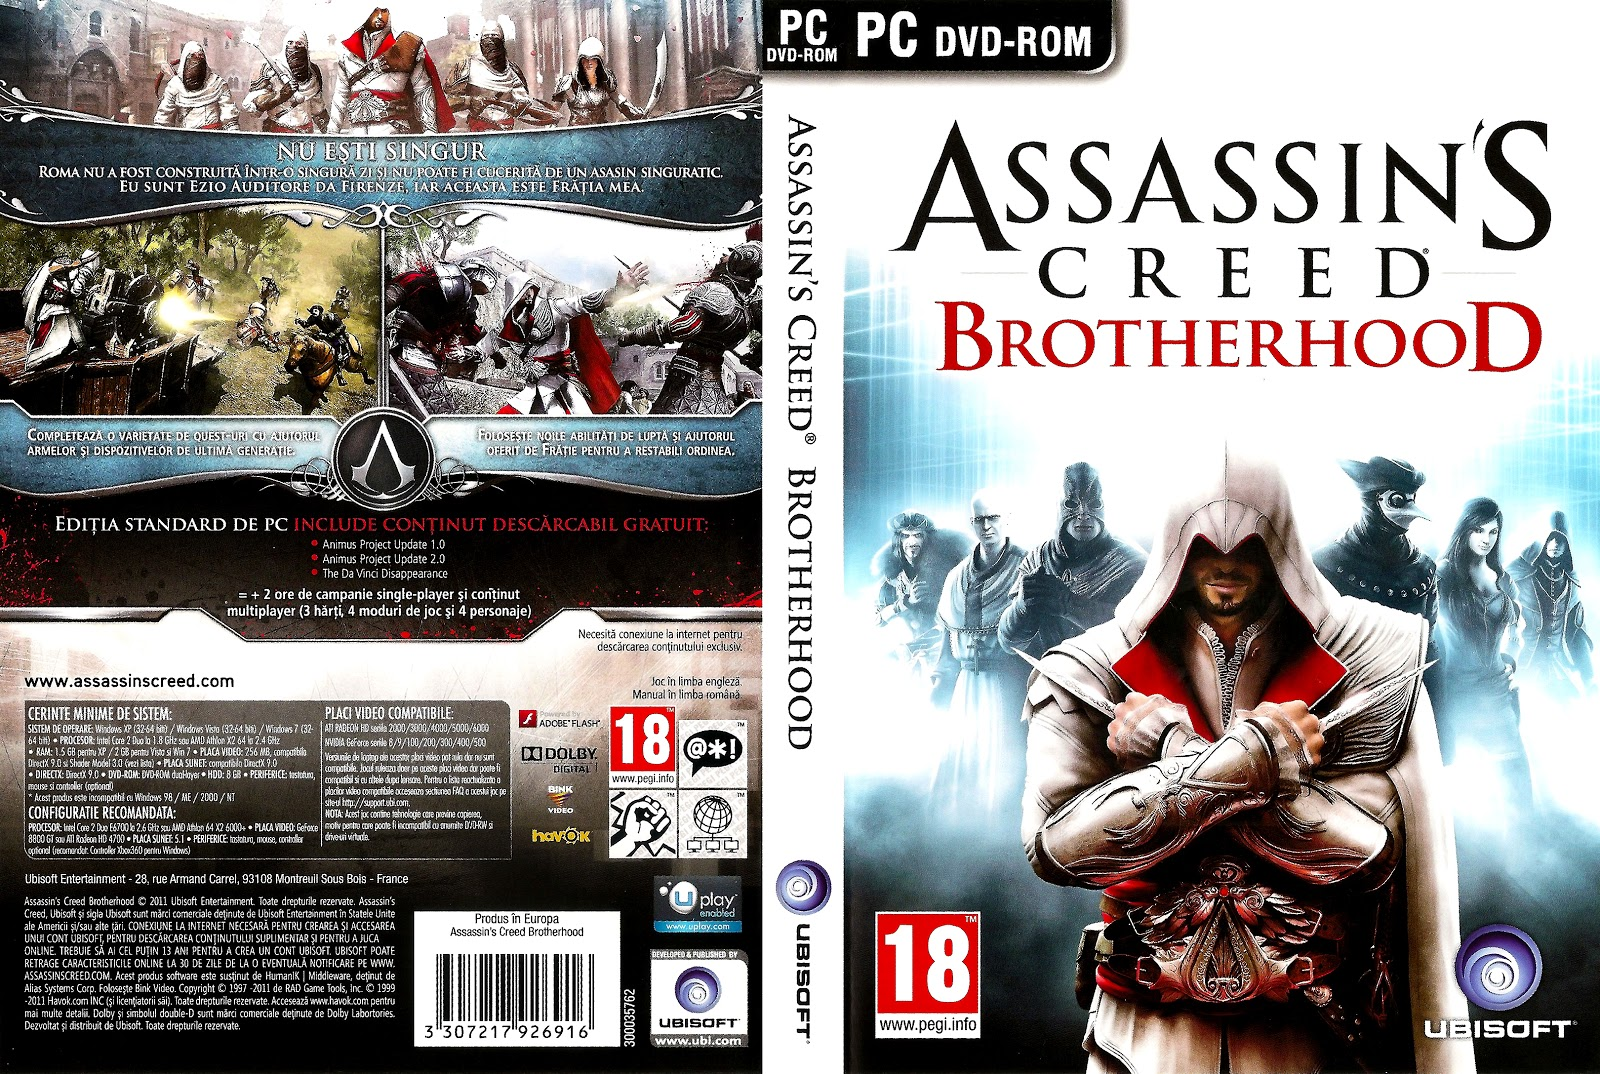 assassins creed 2 multi9 pcdvd9 crack only blogspot